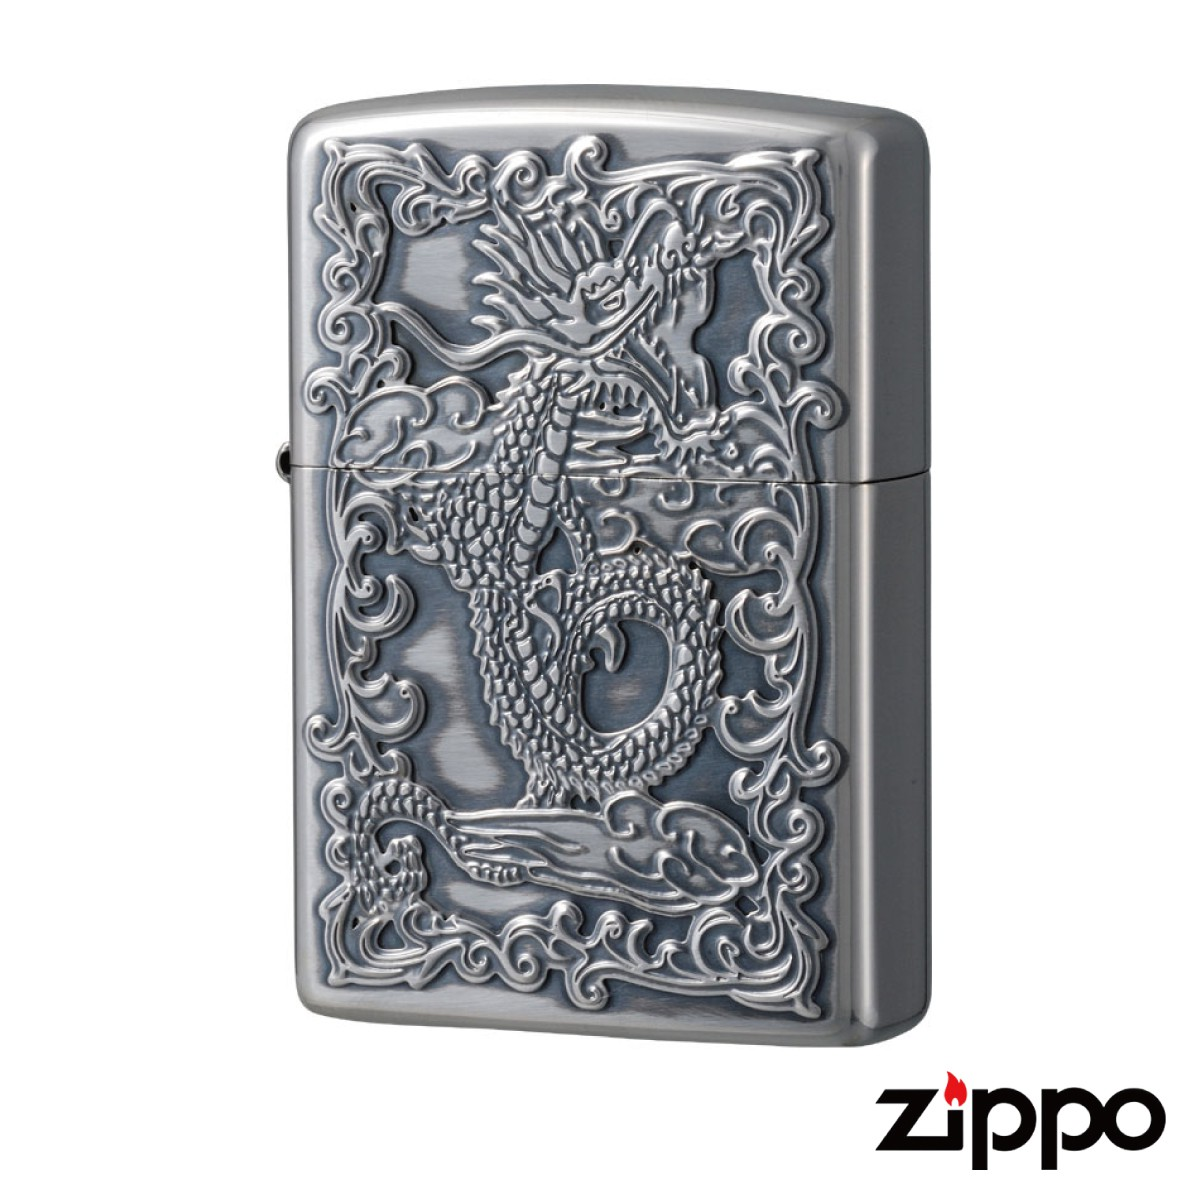 zippo ジッポーライター ライジングドラゴン オイルライター ジッポライター ギフト プレゼント 彼氏 男性 メンズ